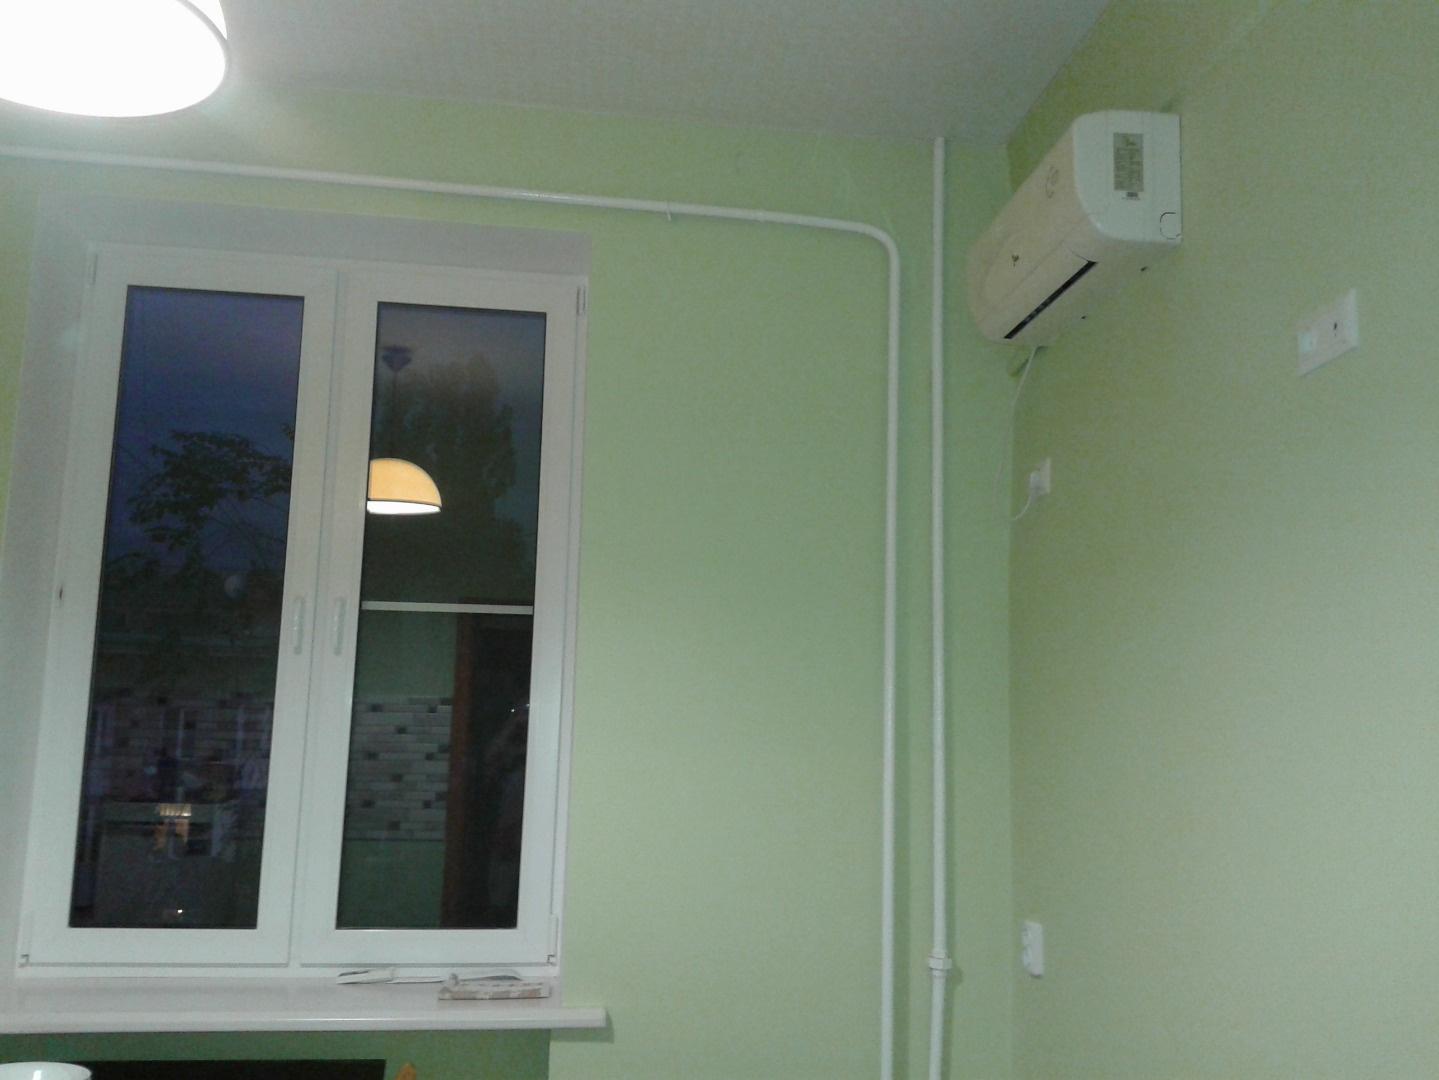 Продается 2-комнатная Квартира на ул. Шевченко Пр. — 90 000 у.е. (фото №15)